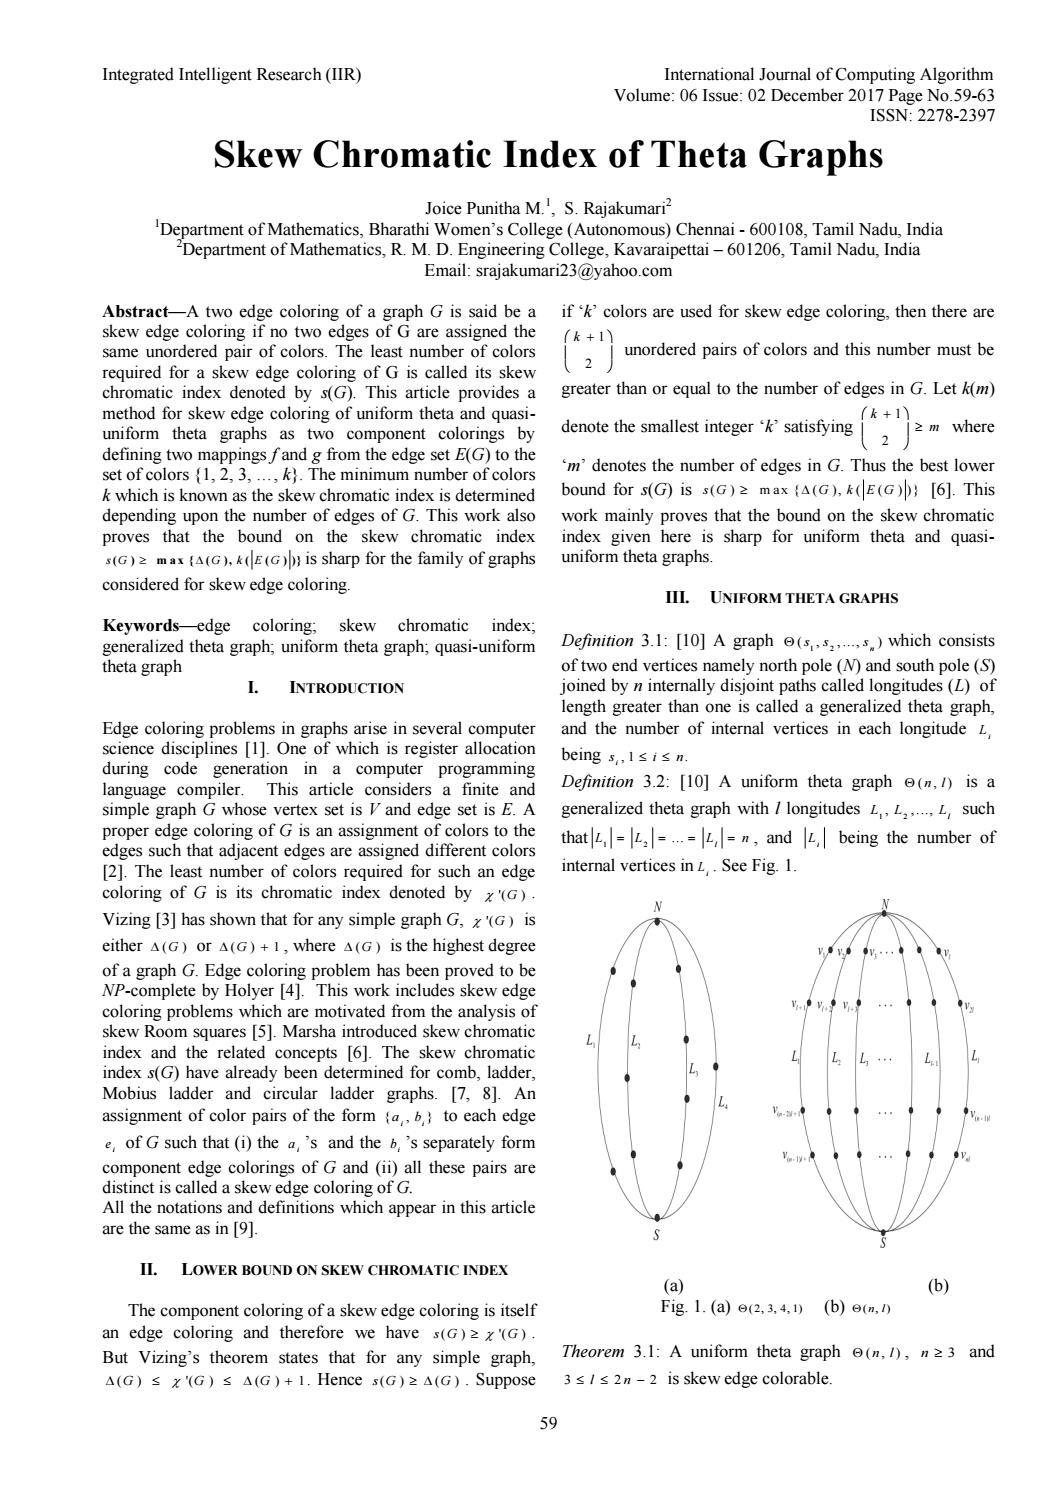 Skew Chromatic Index Of Theta Graphs By Ijcoaeditoriir Issuu